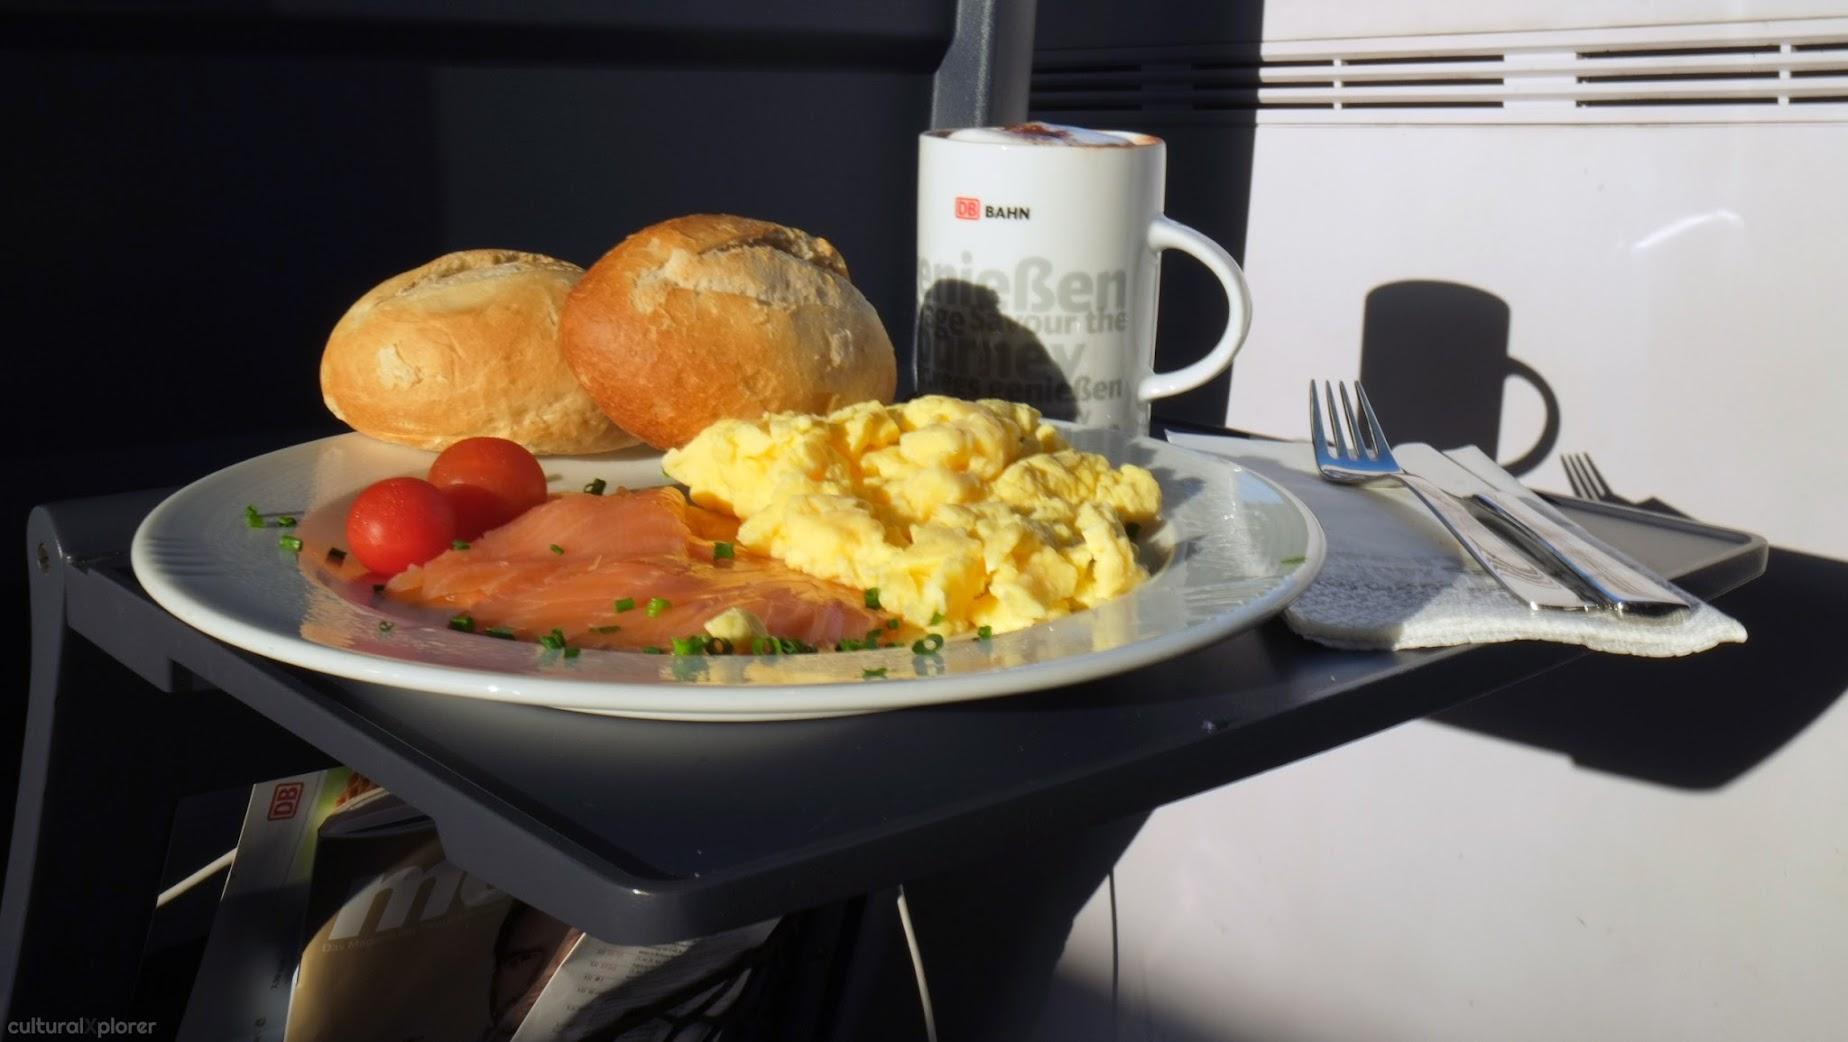 breakfast DB Bahn Germany